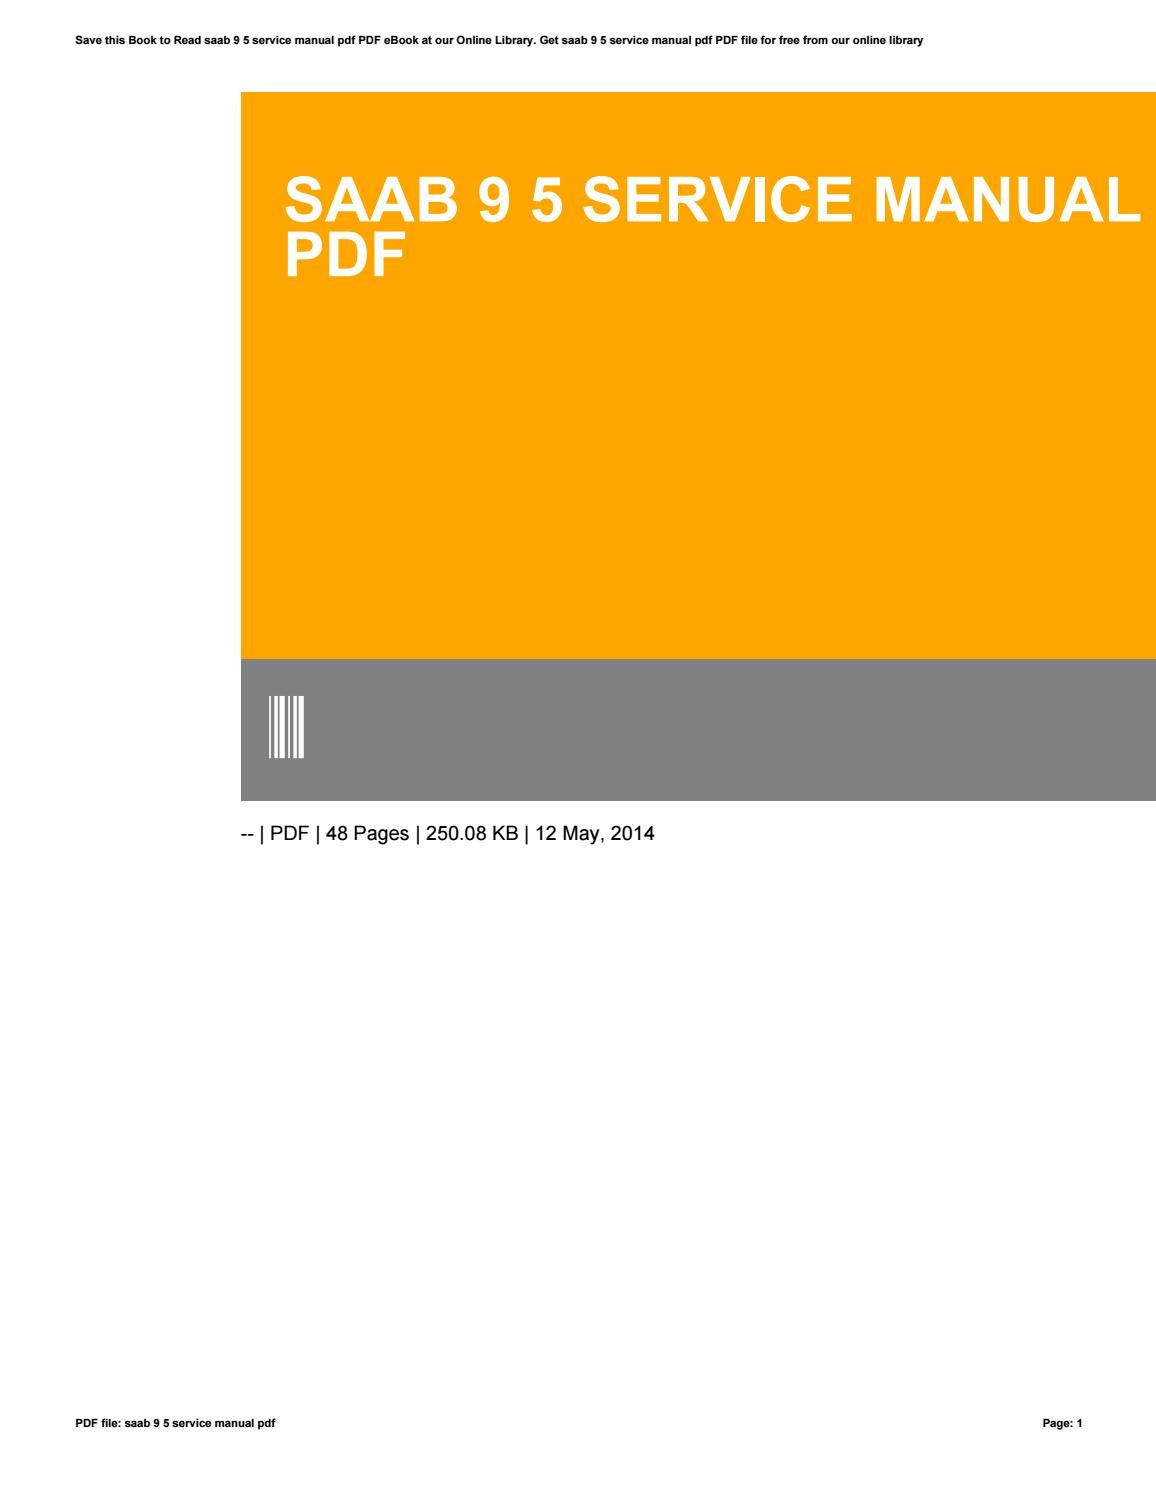 saab 9 5 service manual pdf by anggie45setya issuu rh issuu com saab 9-5 wis service manual 2003 saab 9-5 service manual